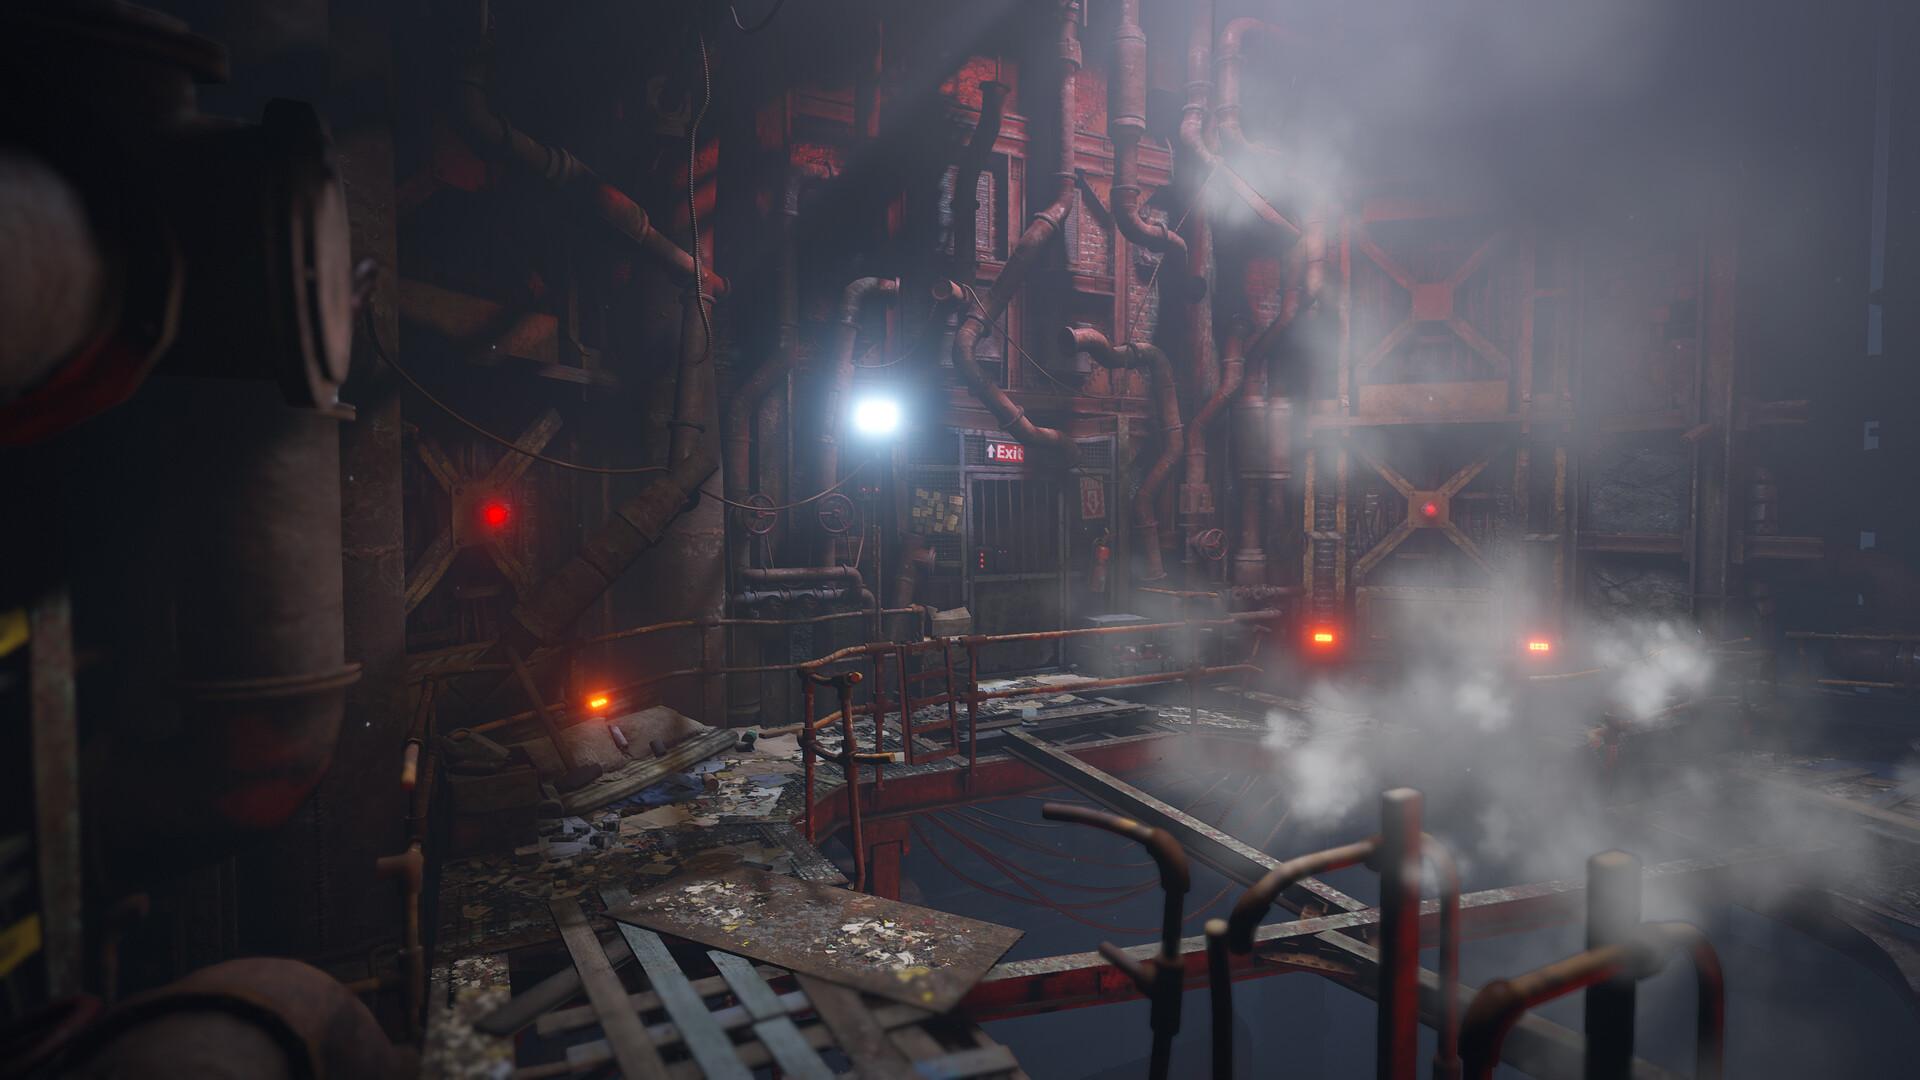 Andrew averkin utopiasyndrome boiler a2 10